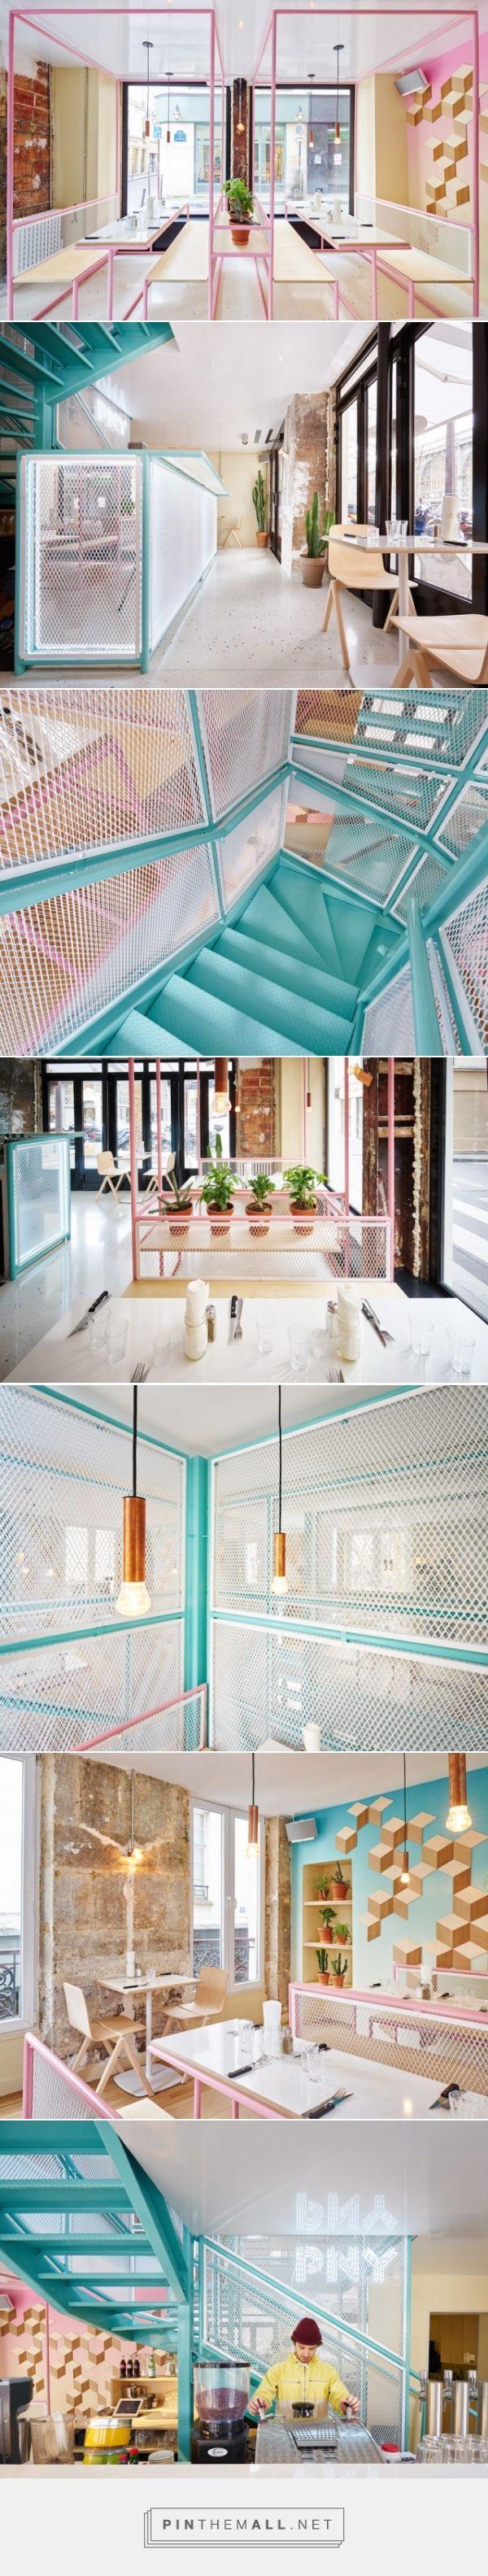 New PNY Restaurant in Paris – Fubiz™ - created via http://pinthemall.net